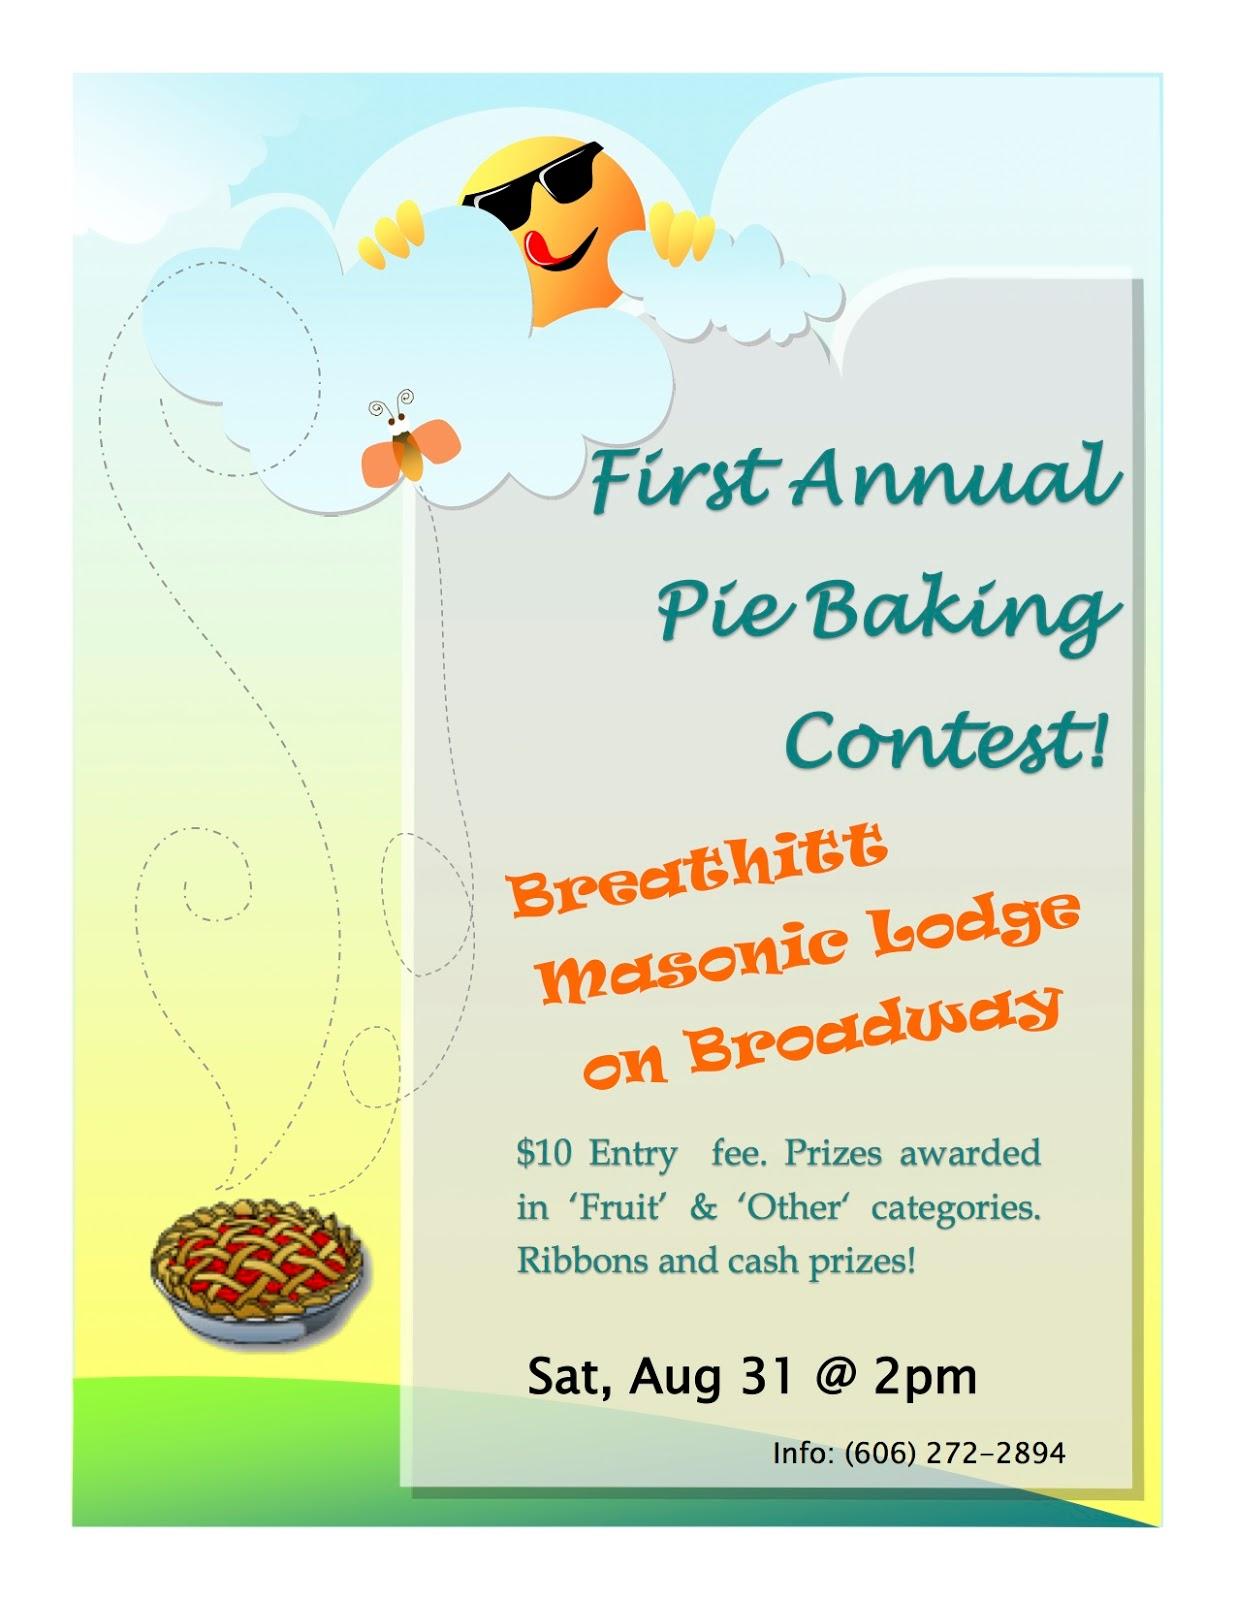 breathitt county honey festival pie baking contest pie baking contest